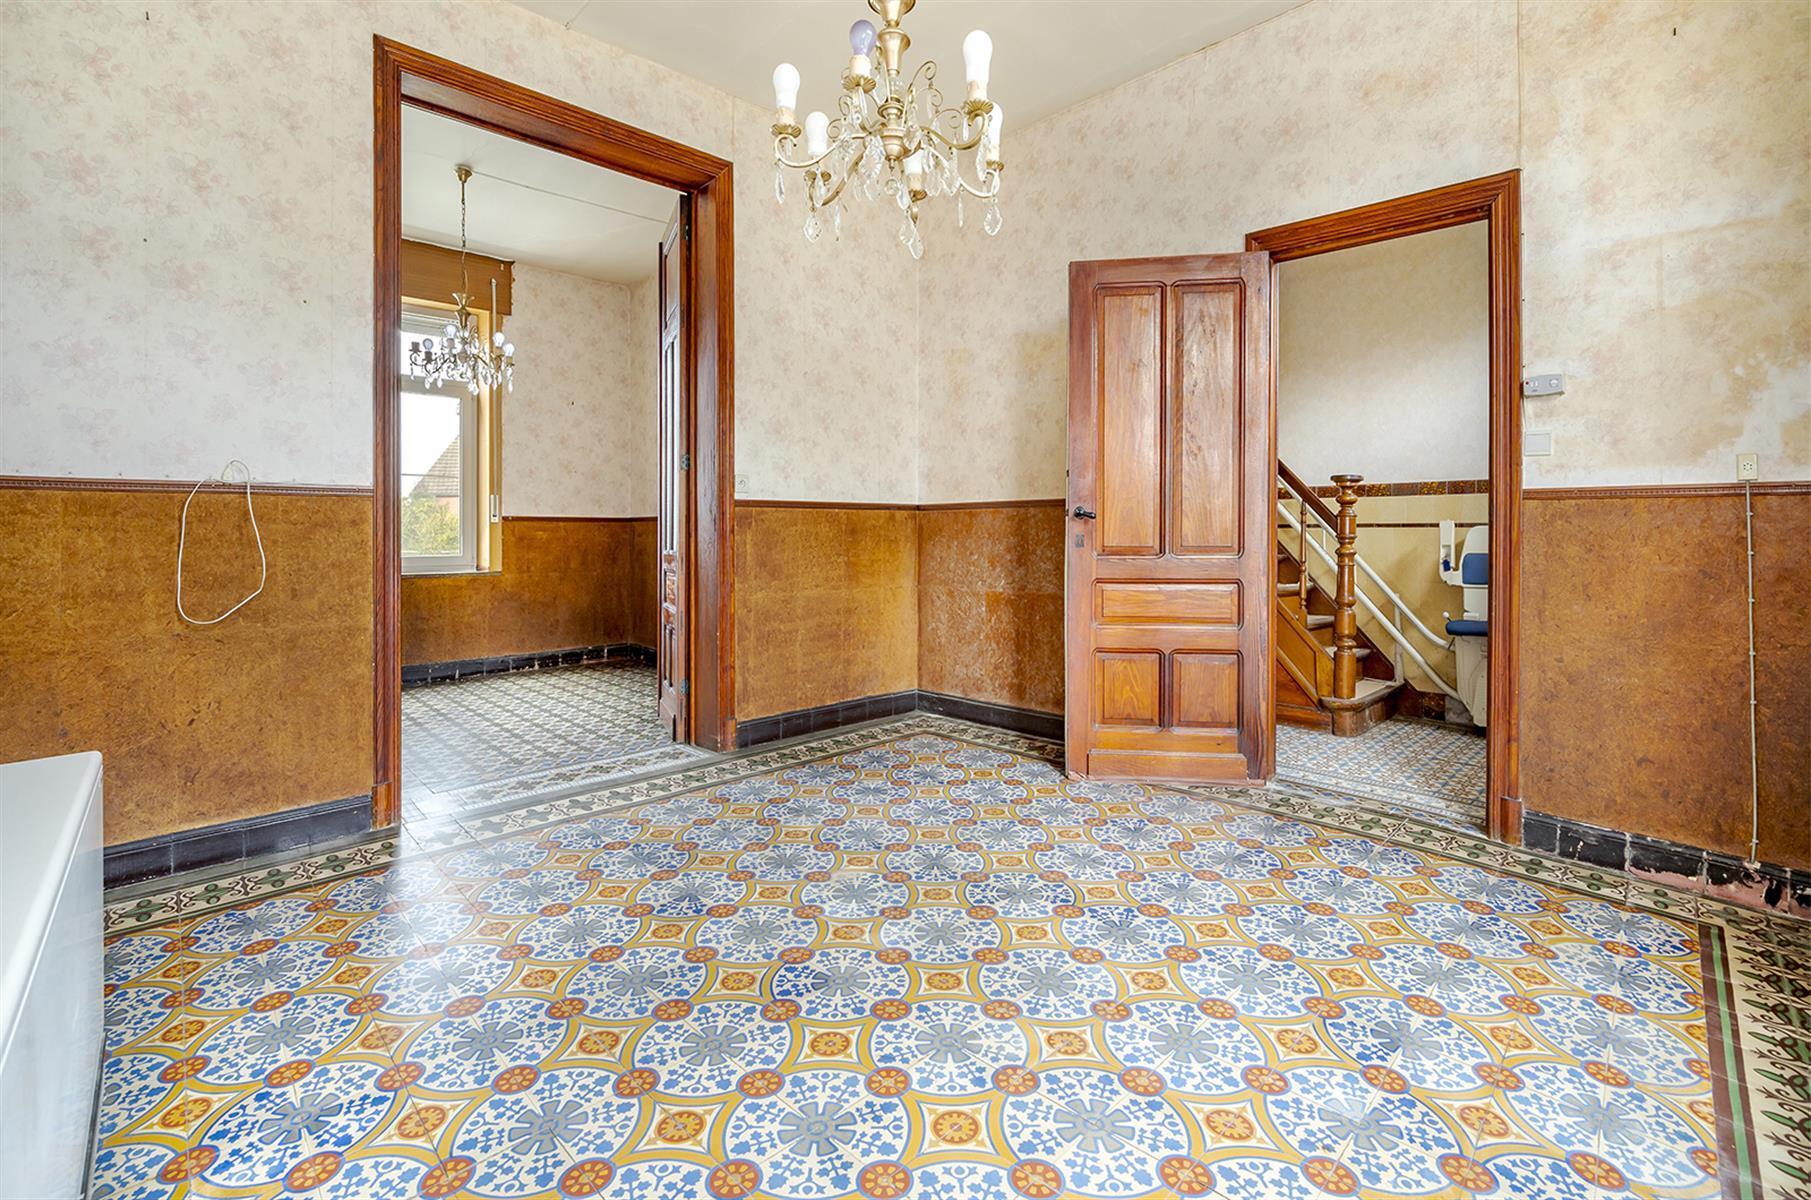 Maison - Hannut - #4182760-6